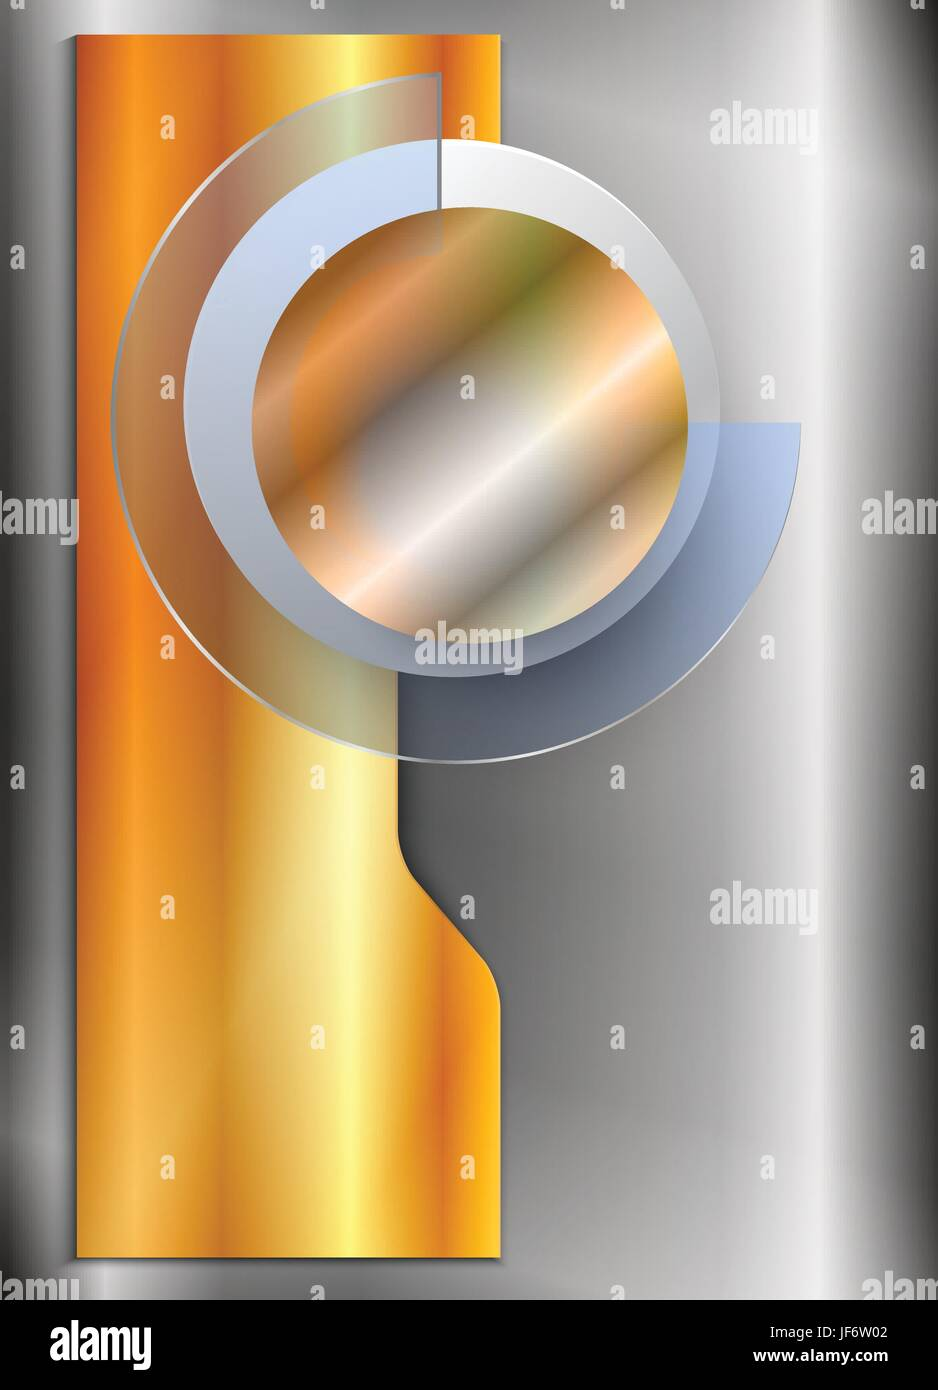 ring, circle, banner, glossy, metallic, shaddow, shadow, gold, ring, steel, - Stock Vector